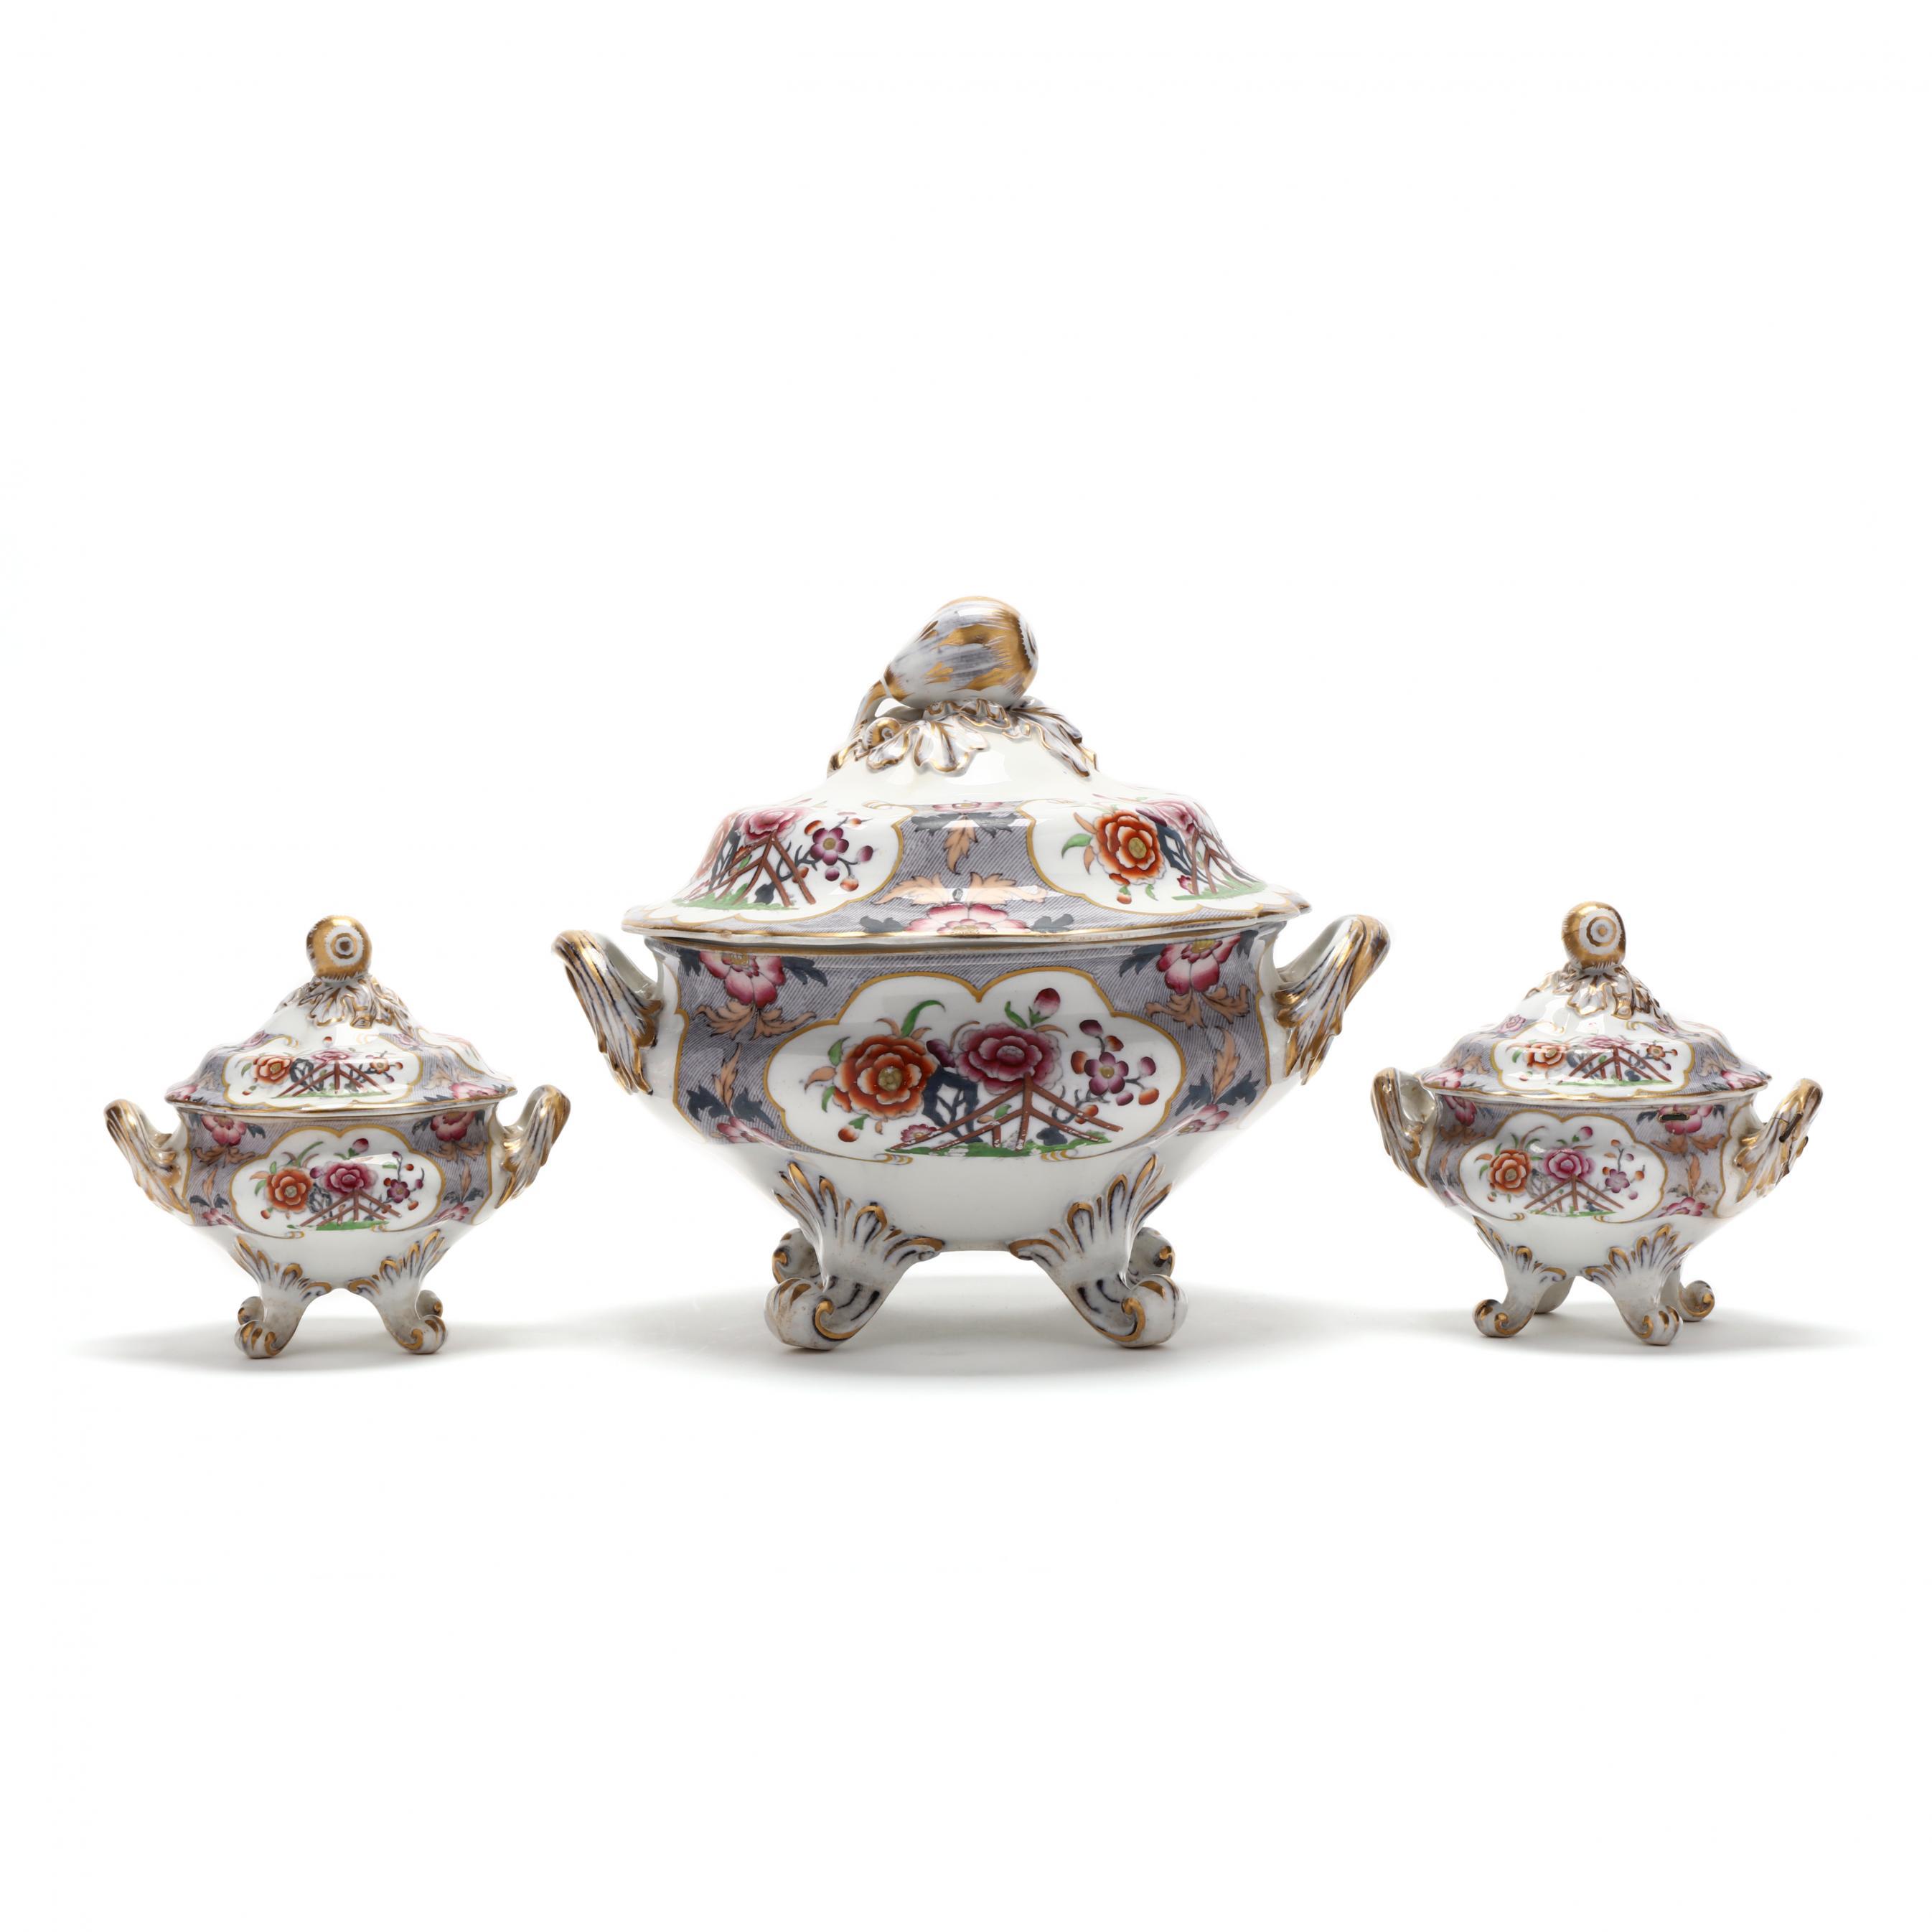 three-antique-transfer-decorated-porcelain-servers